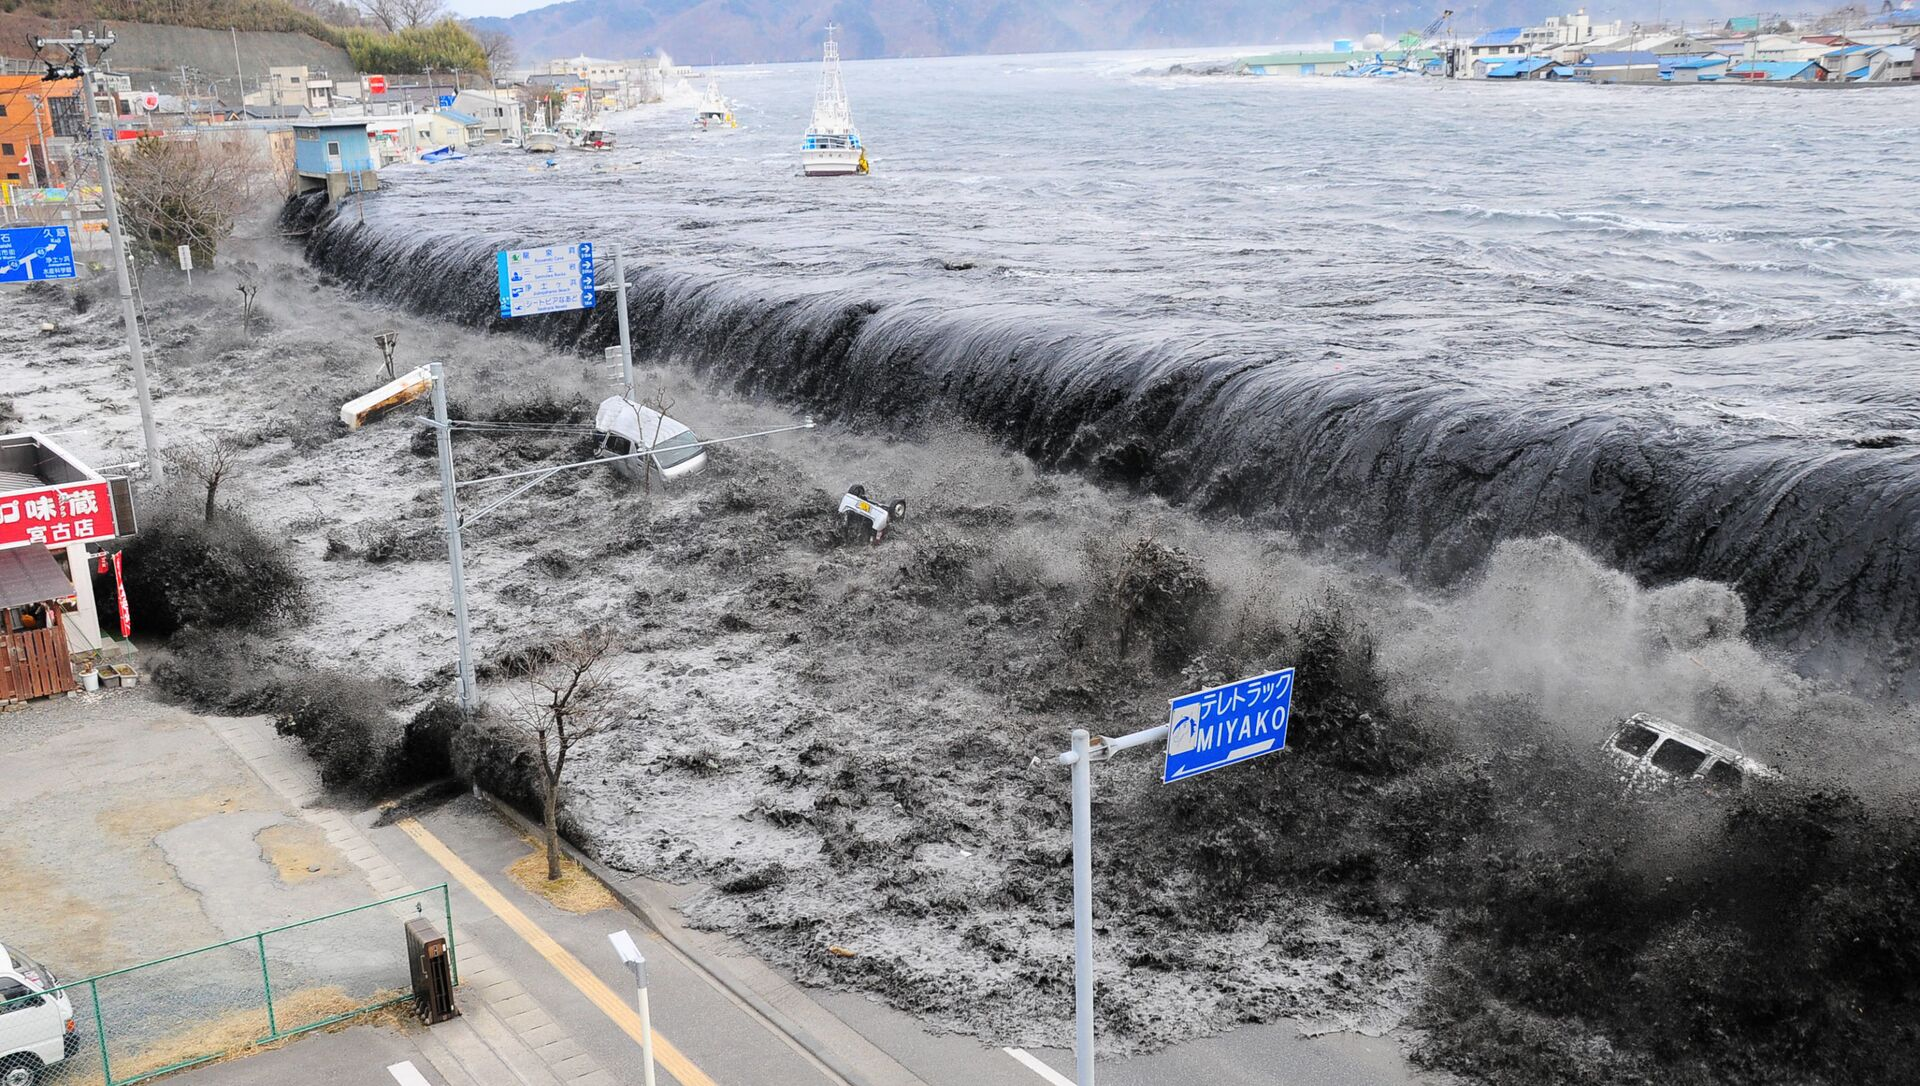 On 11 March 2011 a tsunami hit Miyako in Japan - Sputnik International, 1920, 11.03.2021